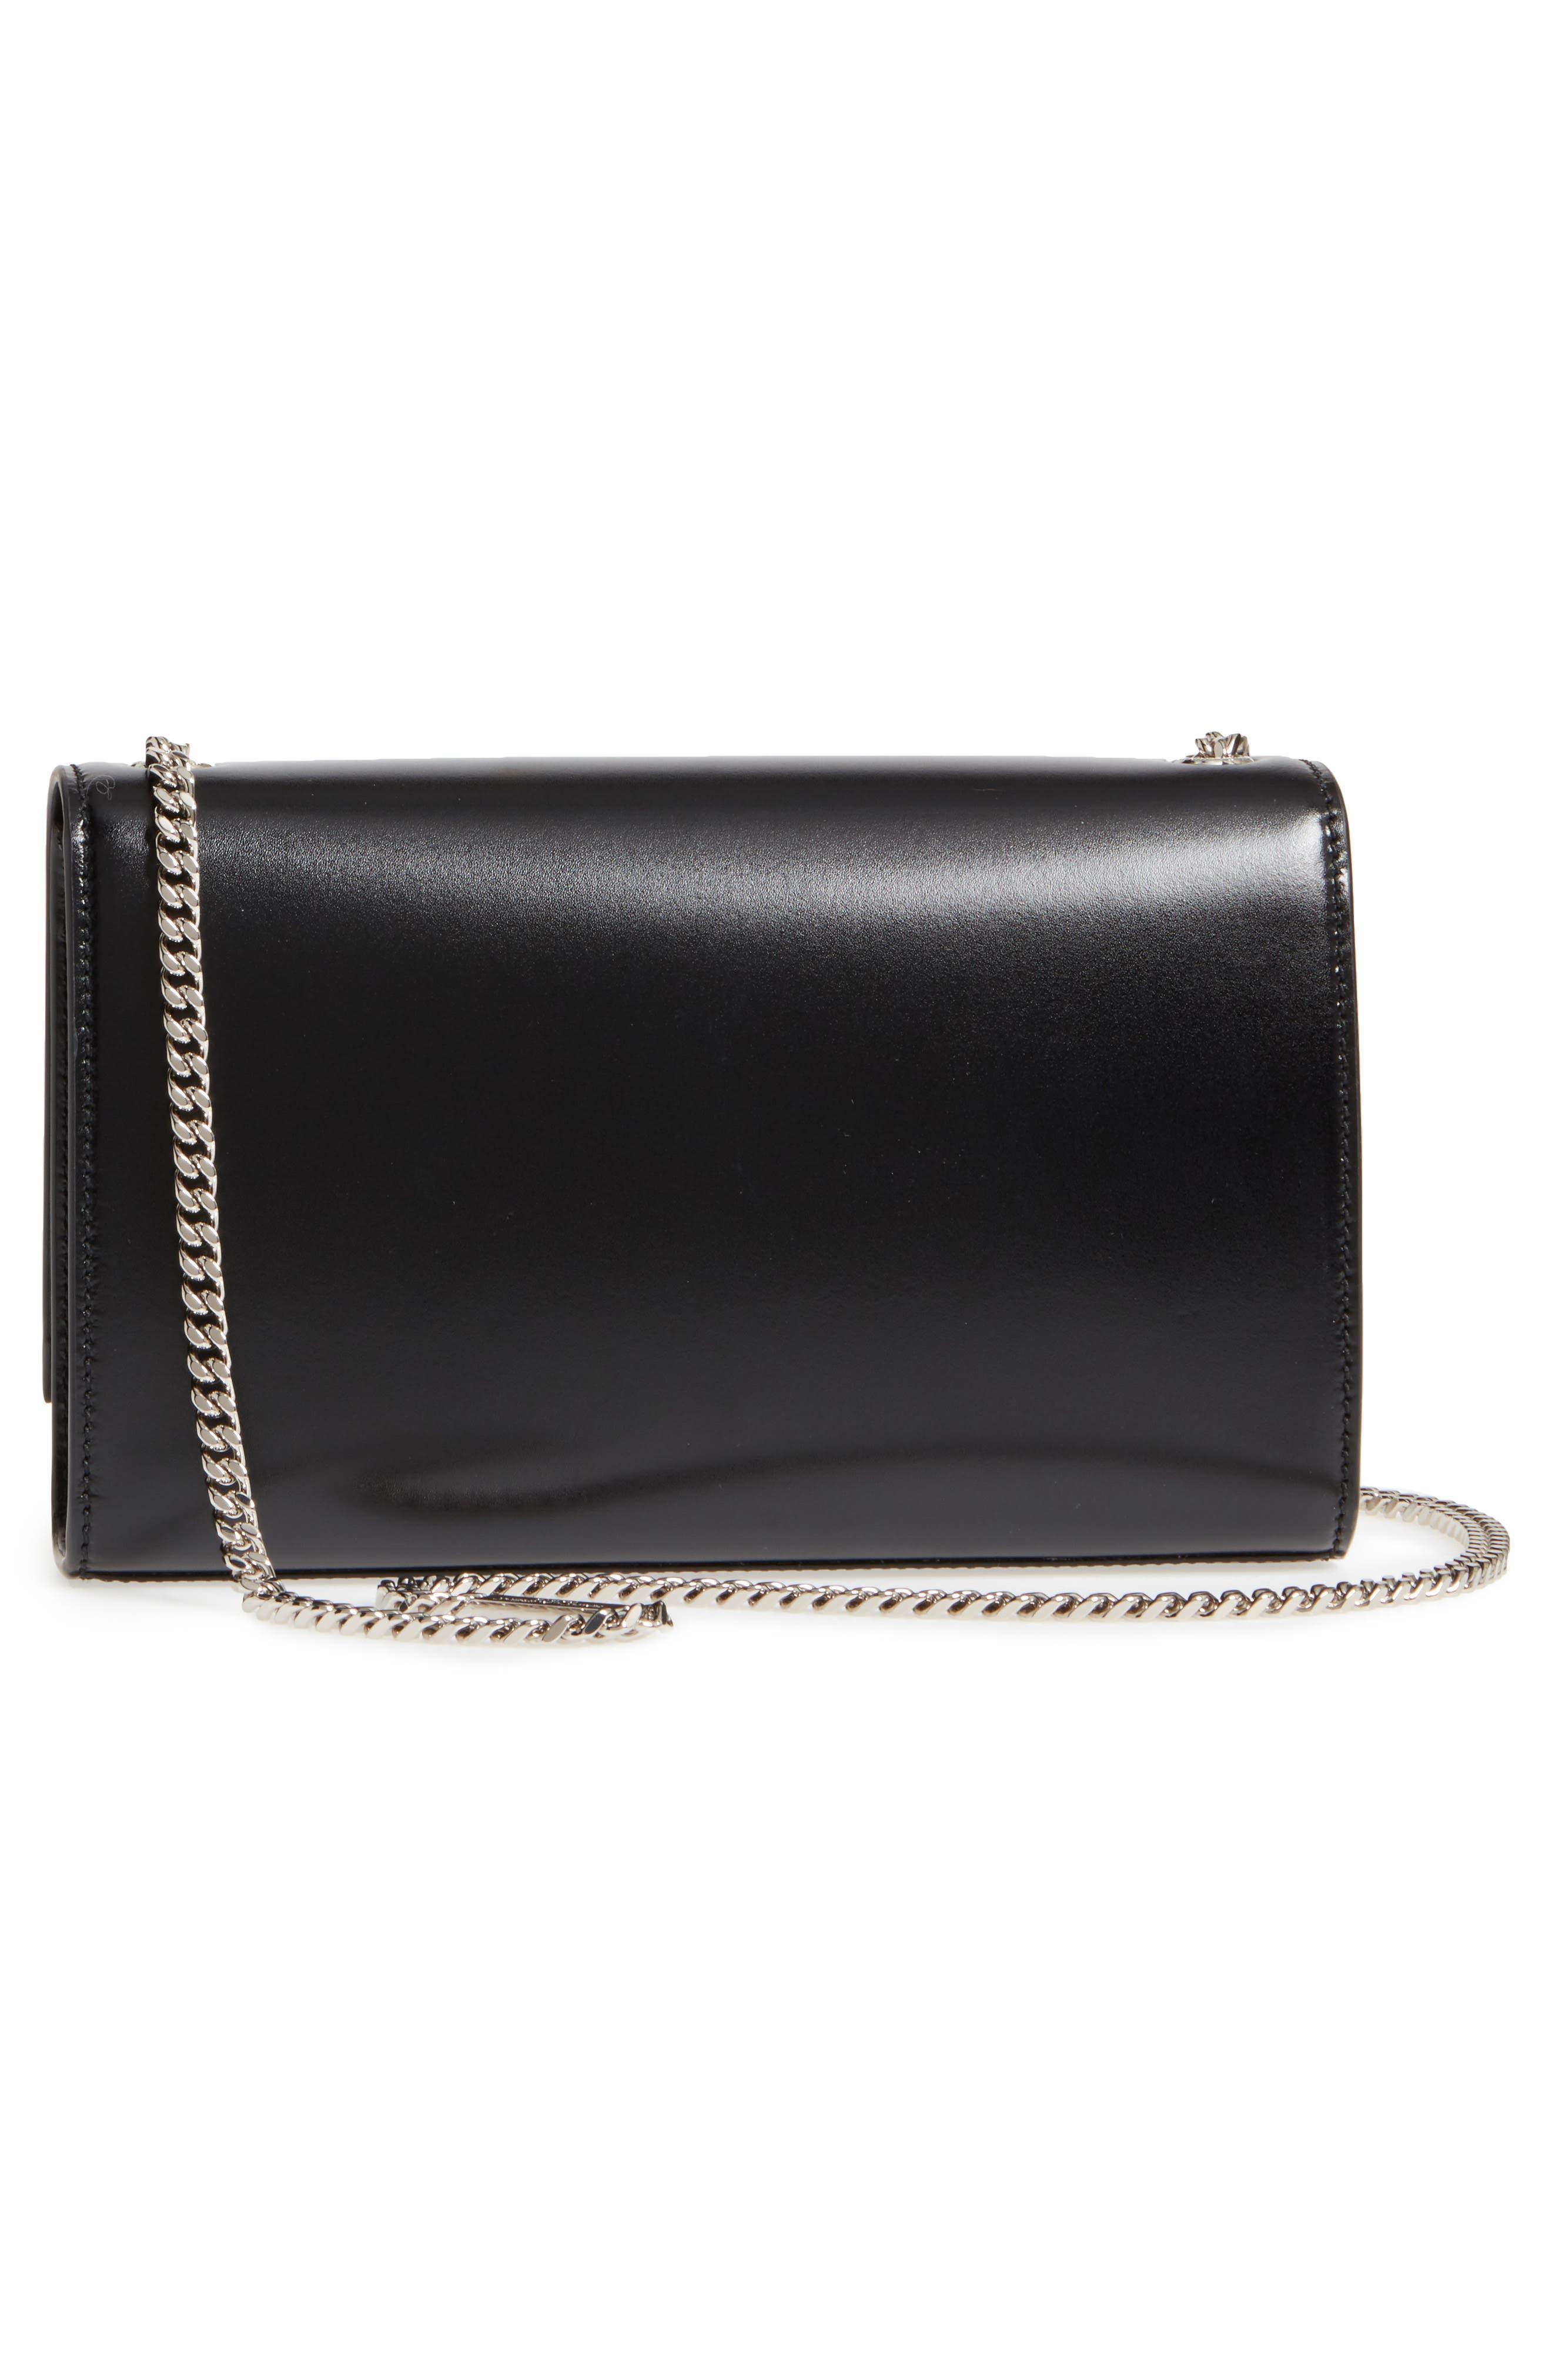 Medium Kate Calfskin Leather Crossbody Bag,                             Alternate thumbnail 3, color,                             001